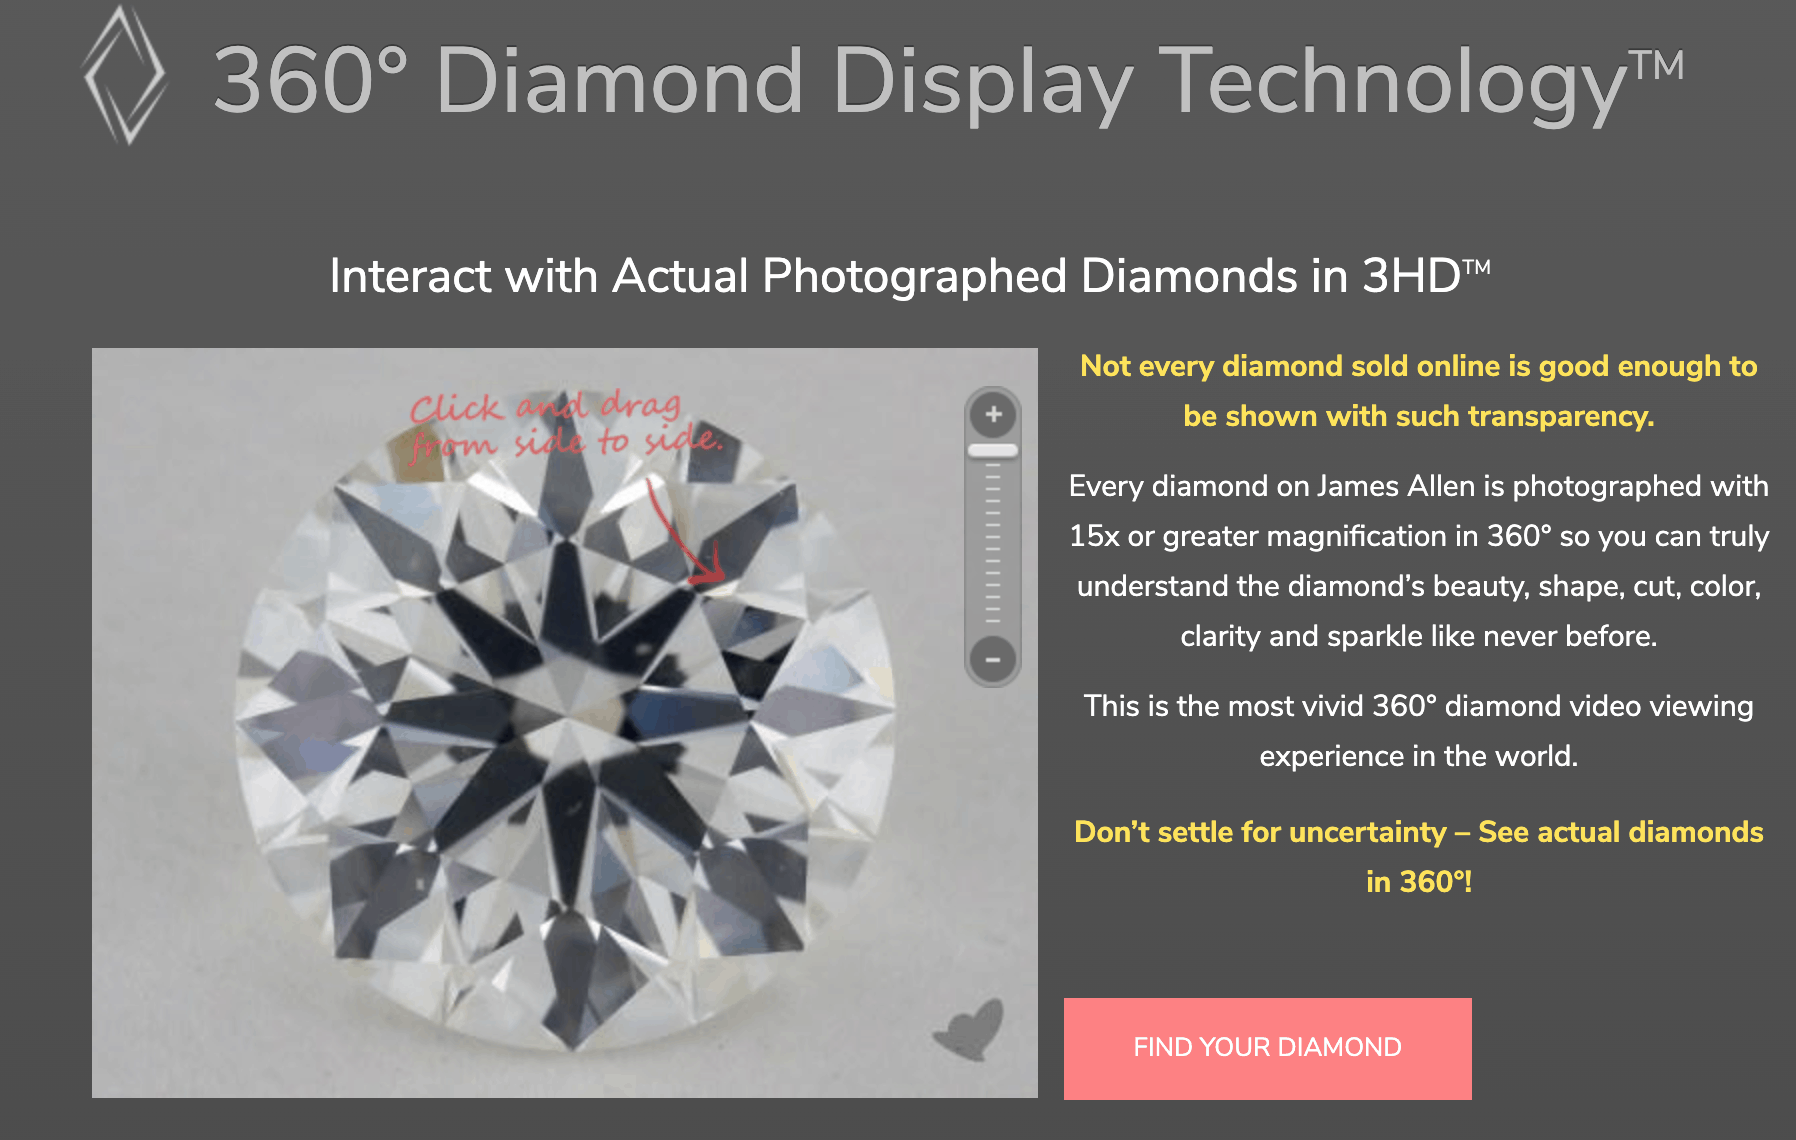 360 diamond display technology